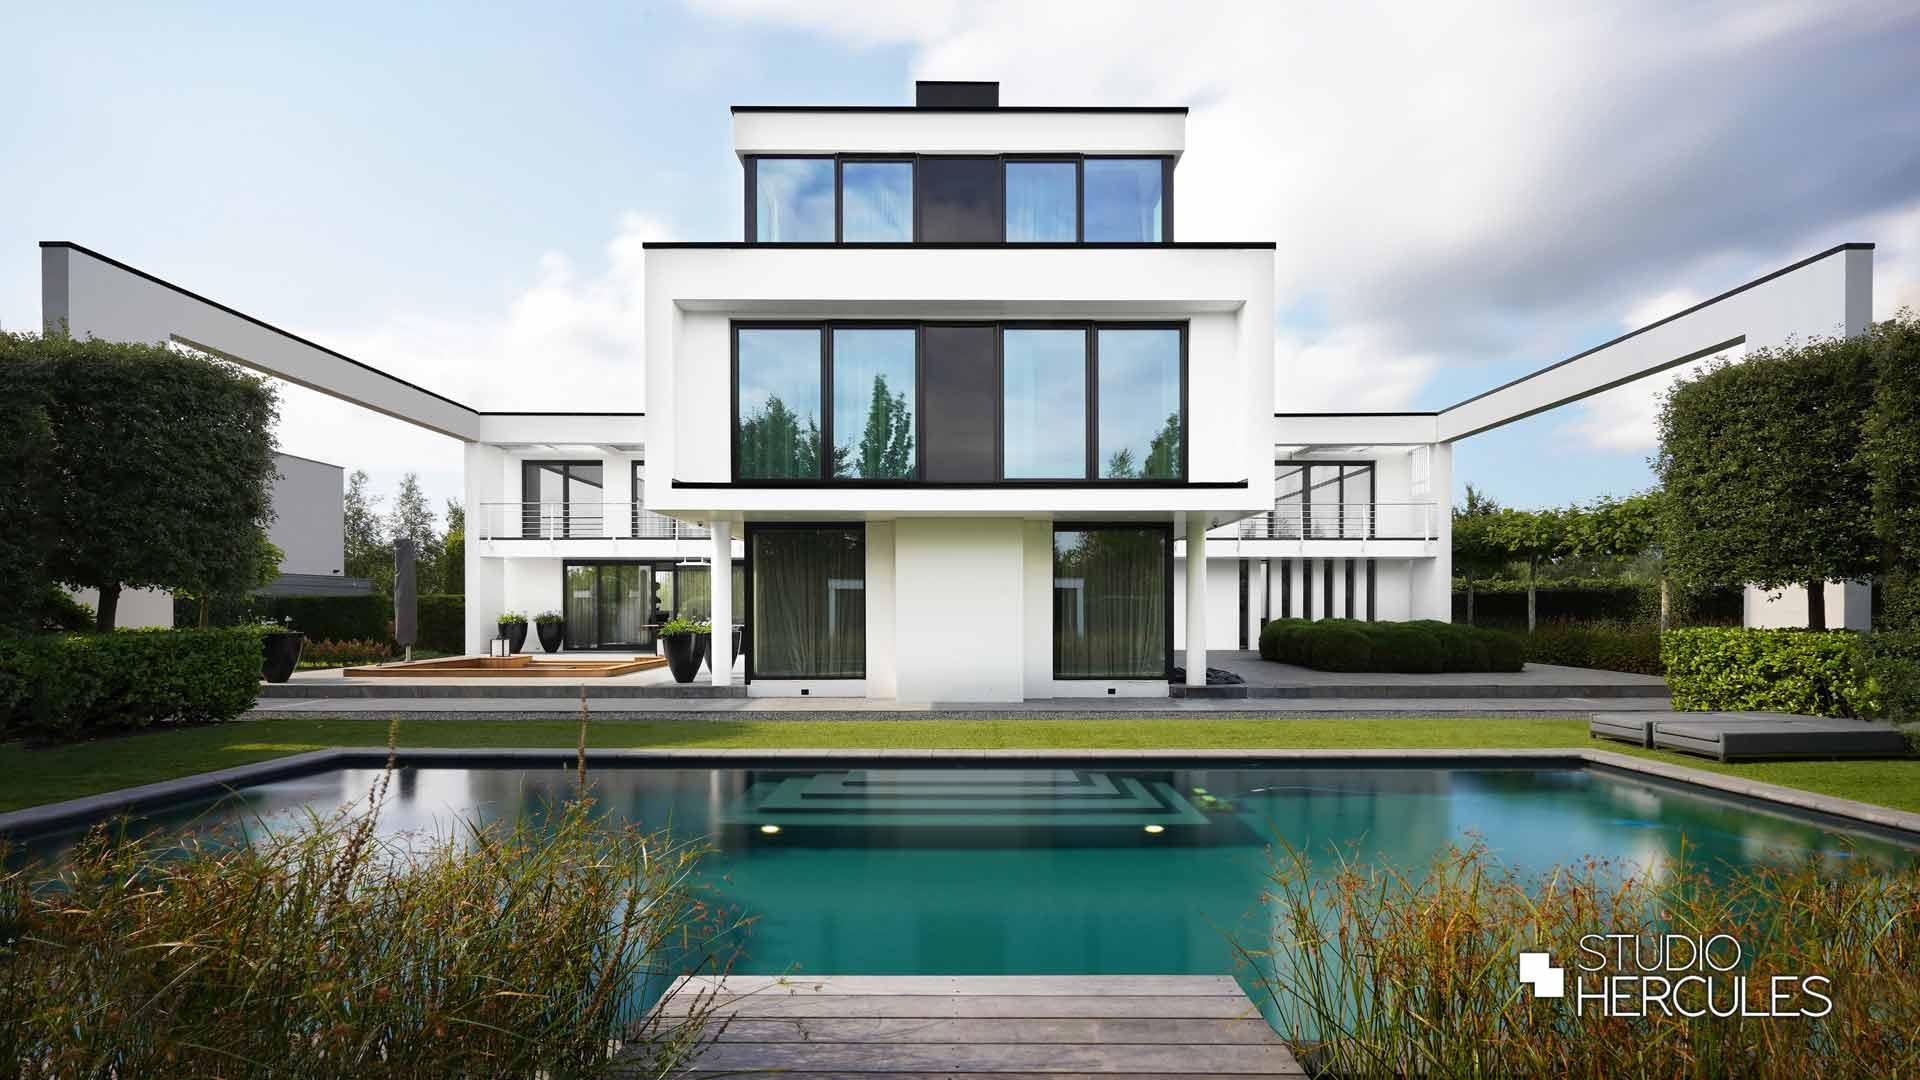 Symmetrie modern villa modernistisch architect StudioHercules